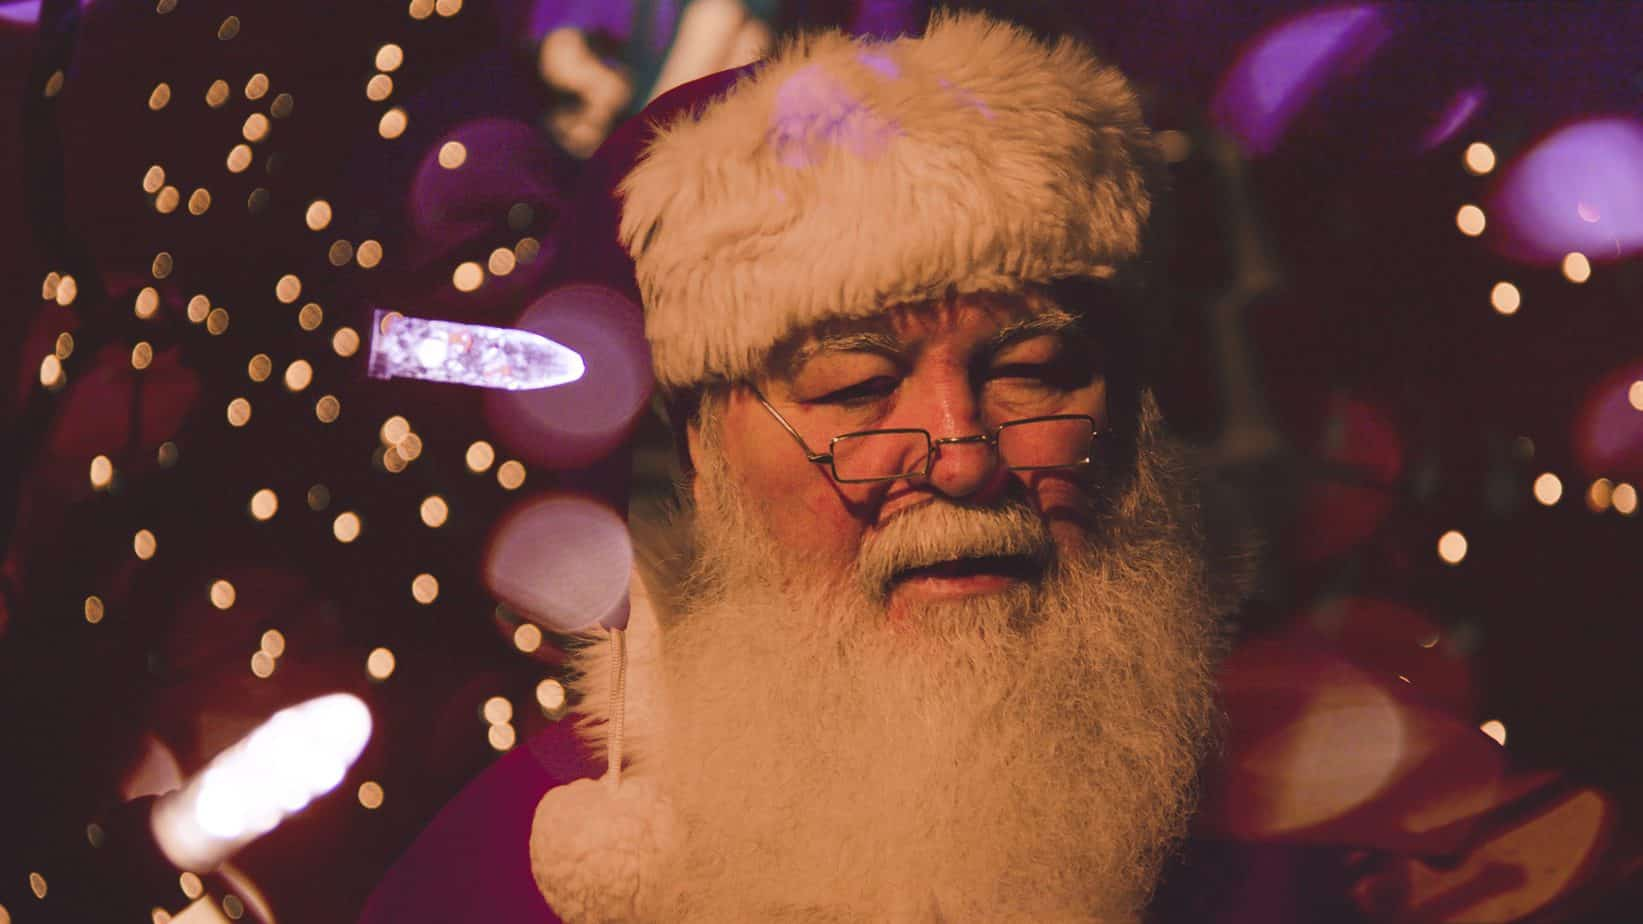 The Day I dressed As Santa - By Carol